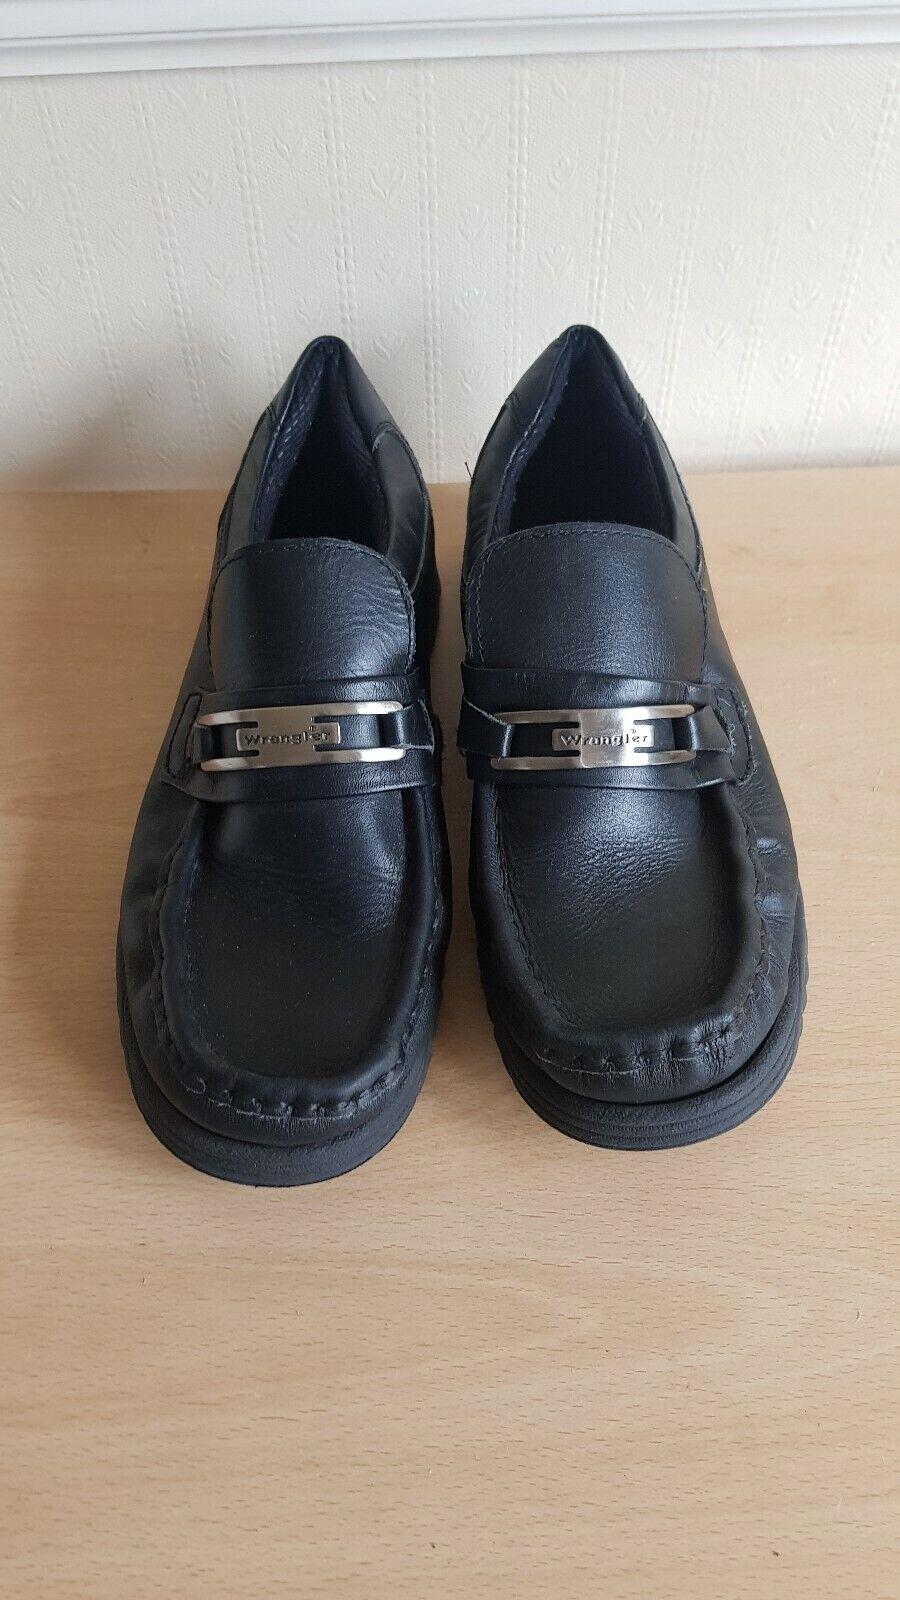 WRANGLER FOOTWEAR BLACK MEN'S LEATHER SHOES (UK SIZE 8, EU 42)